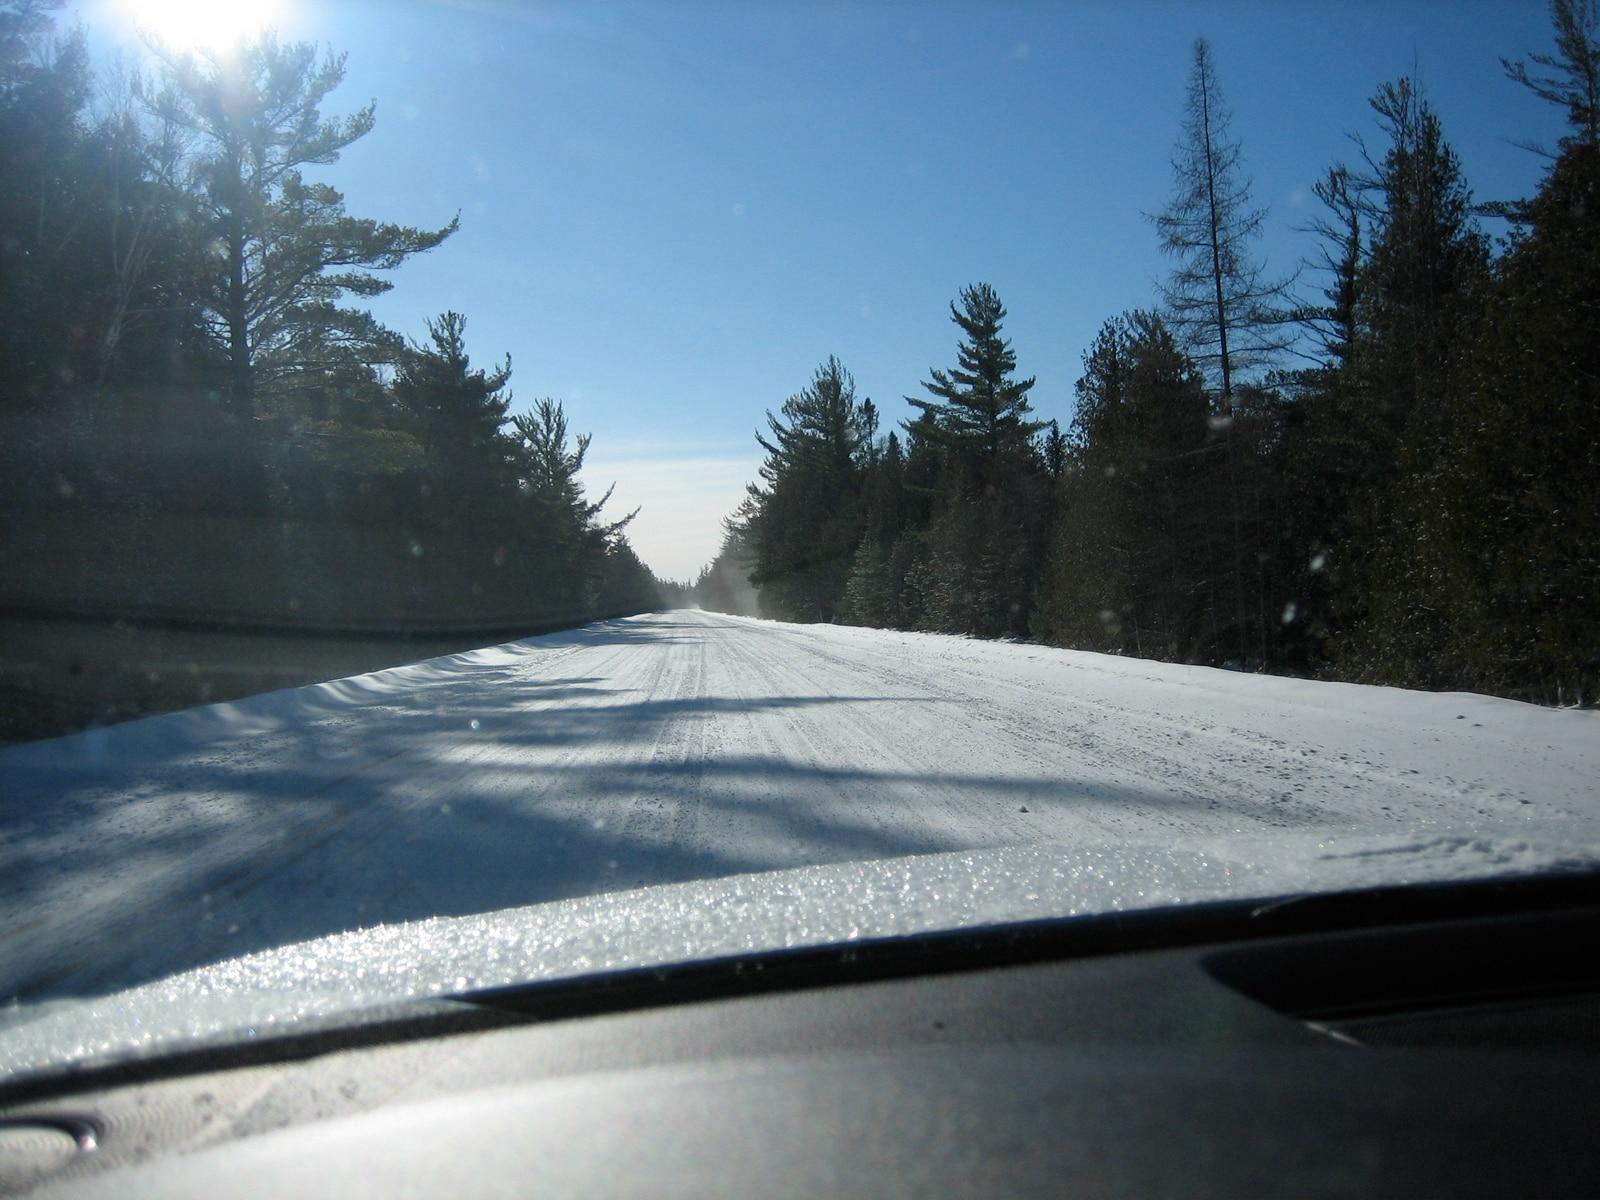 0911 01 Z Snowtires Driving On Snow